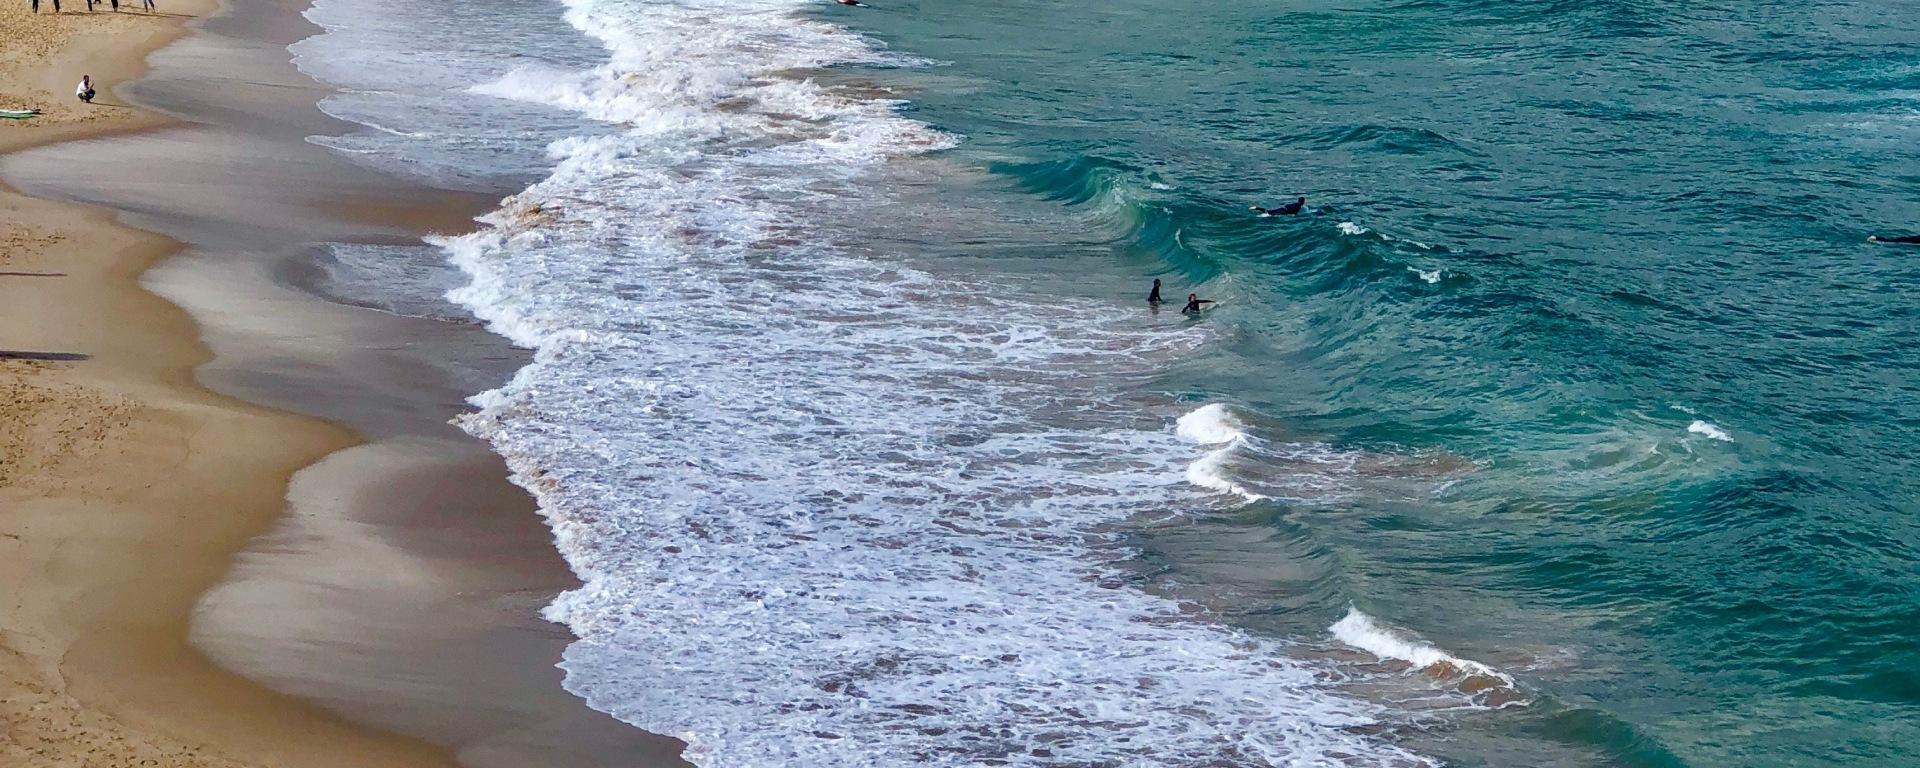 australia, sydney, travel, tourism, explore, oceania, bondi beach